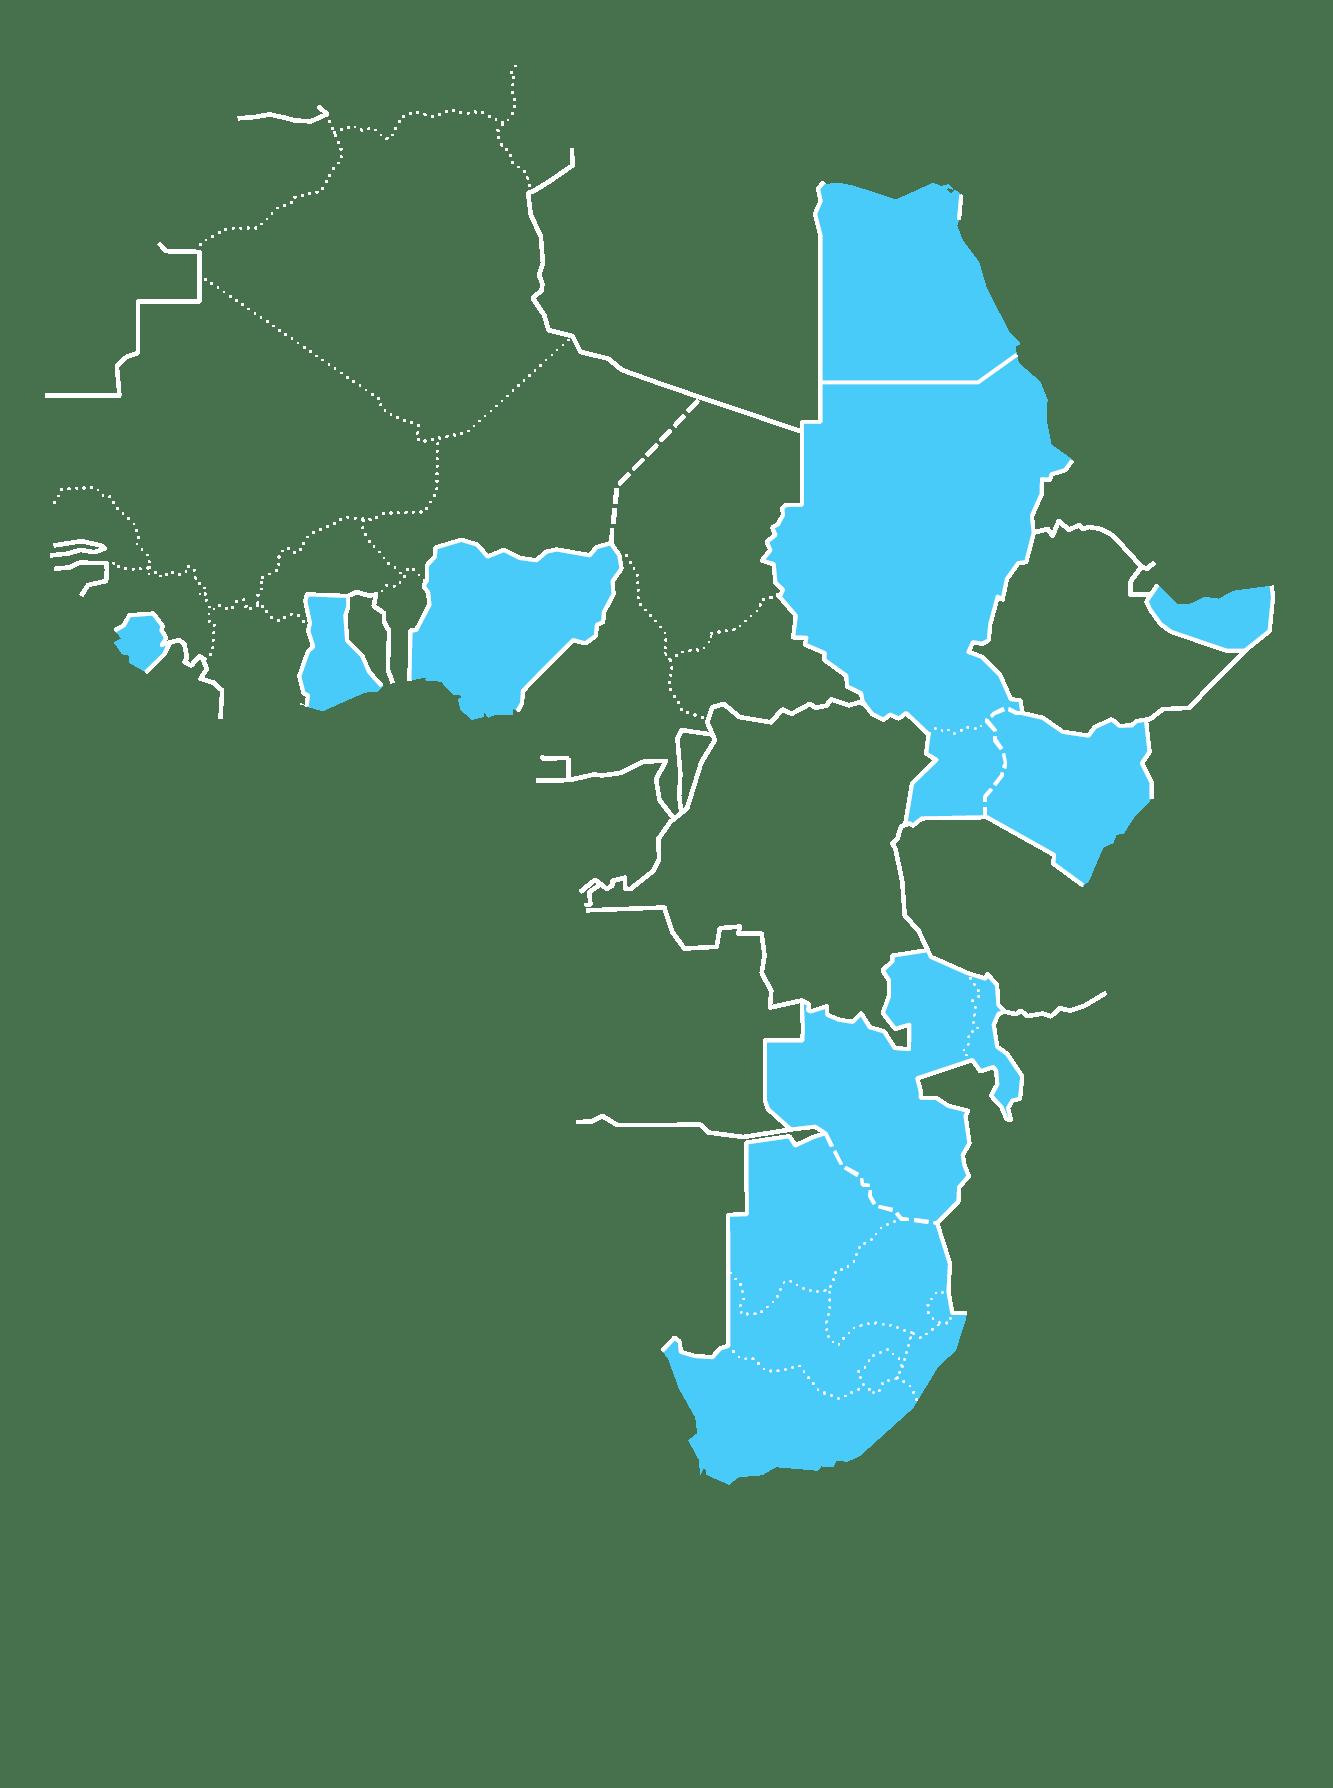 Colonies et protectorats Britanniques